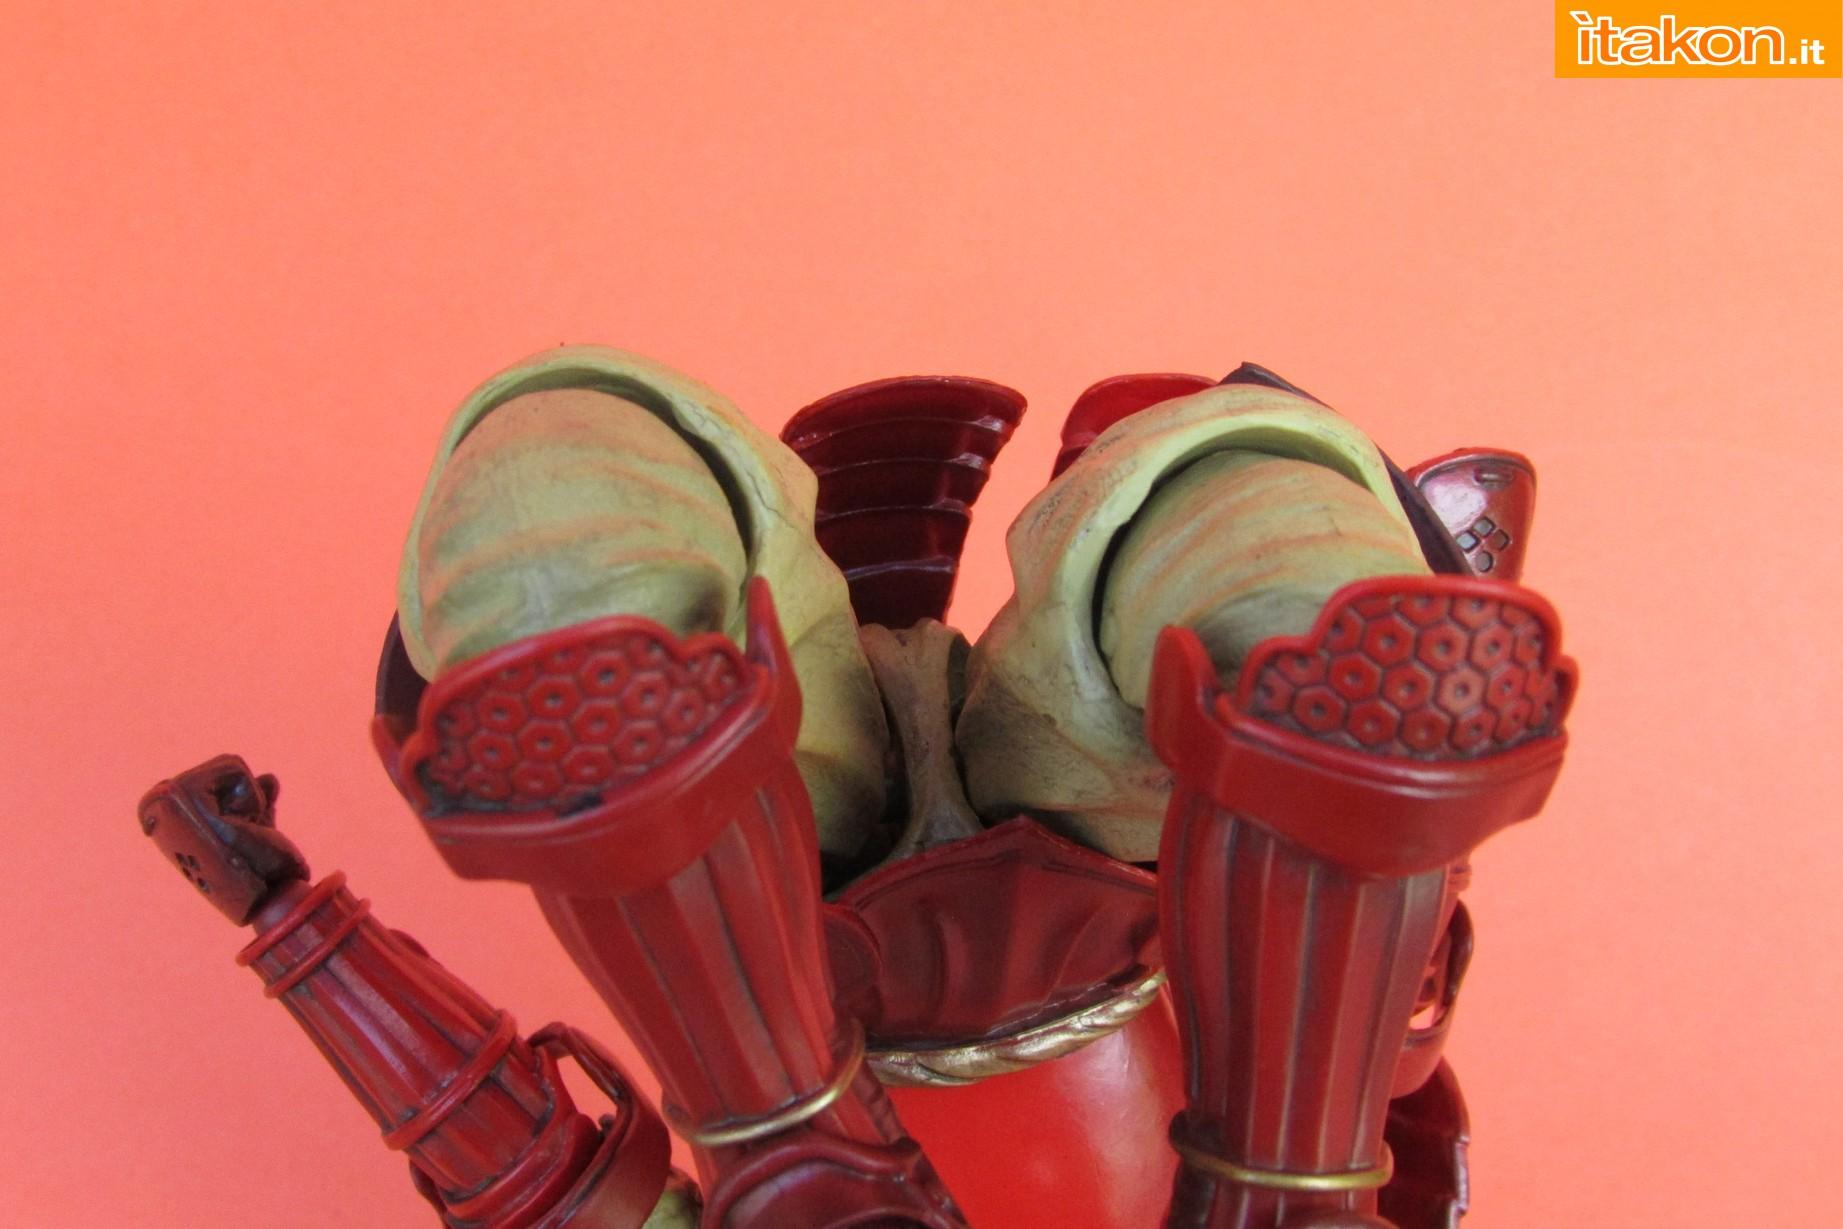 Link a Marvel Comics Koutetsu Samurai Iron Man Mark 3 Meishou MANGA REALIZATION review Bandai Itakon.it31